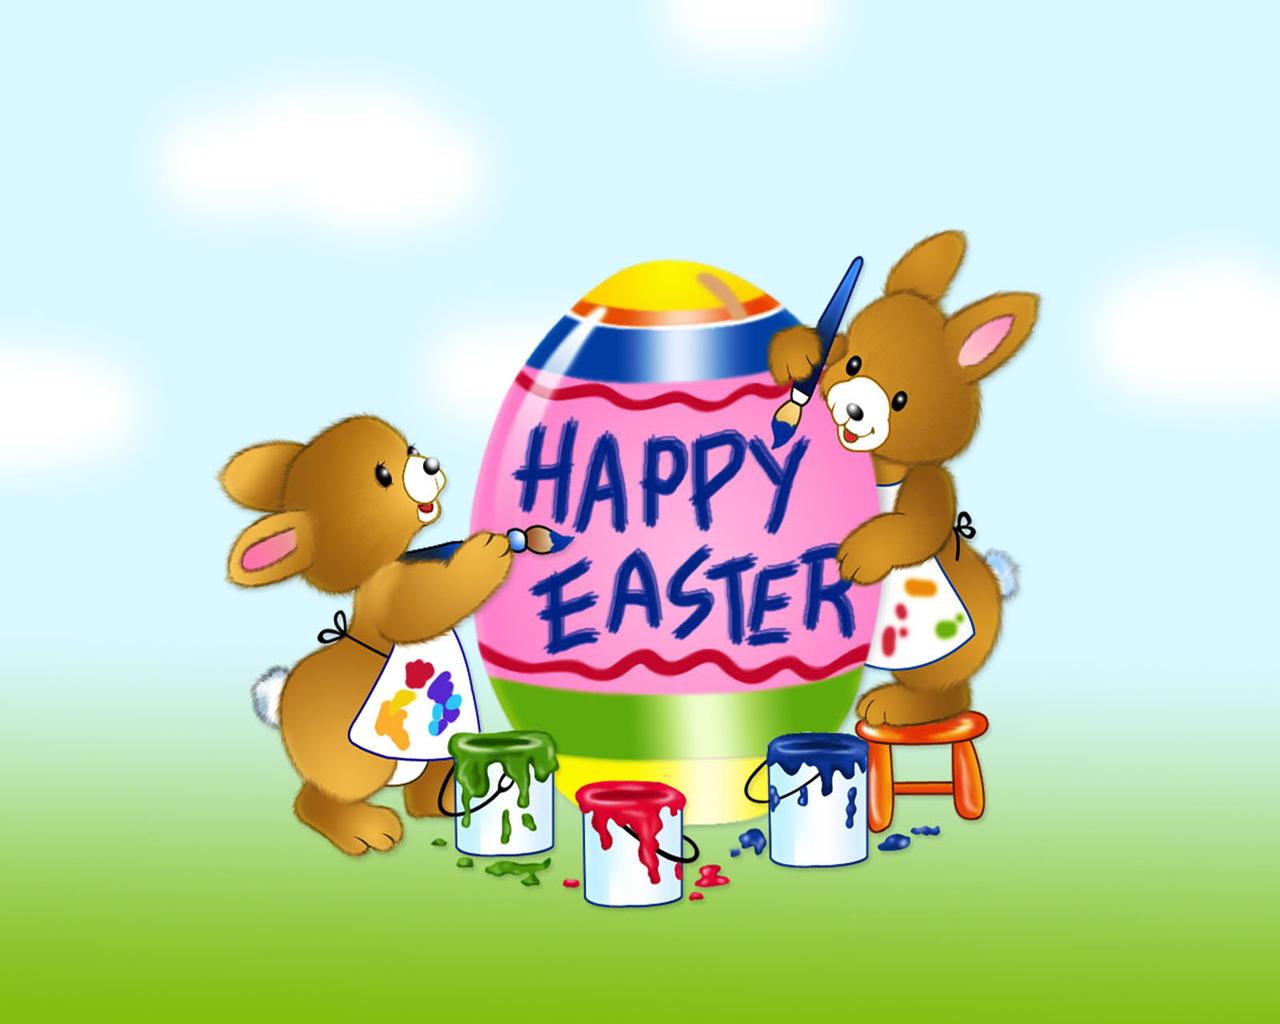 Happy Easter Wishes, Happy Easter 2014 Wishes, Happy Easter 2014 ...